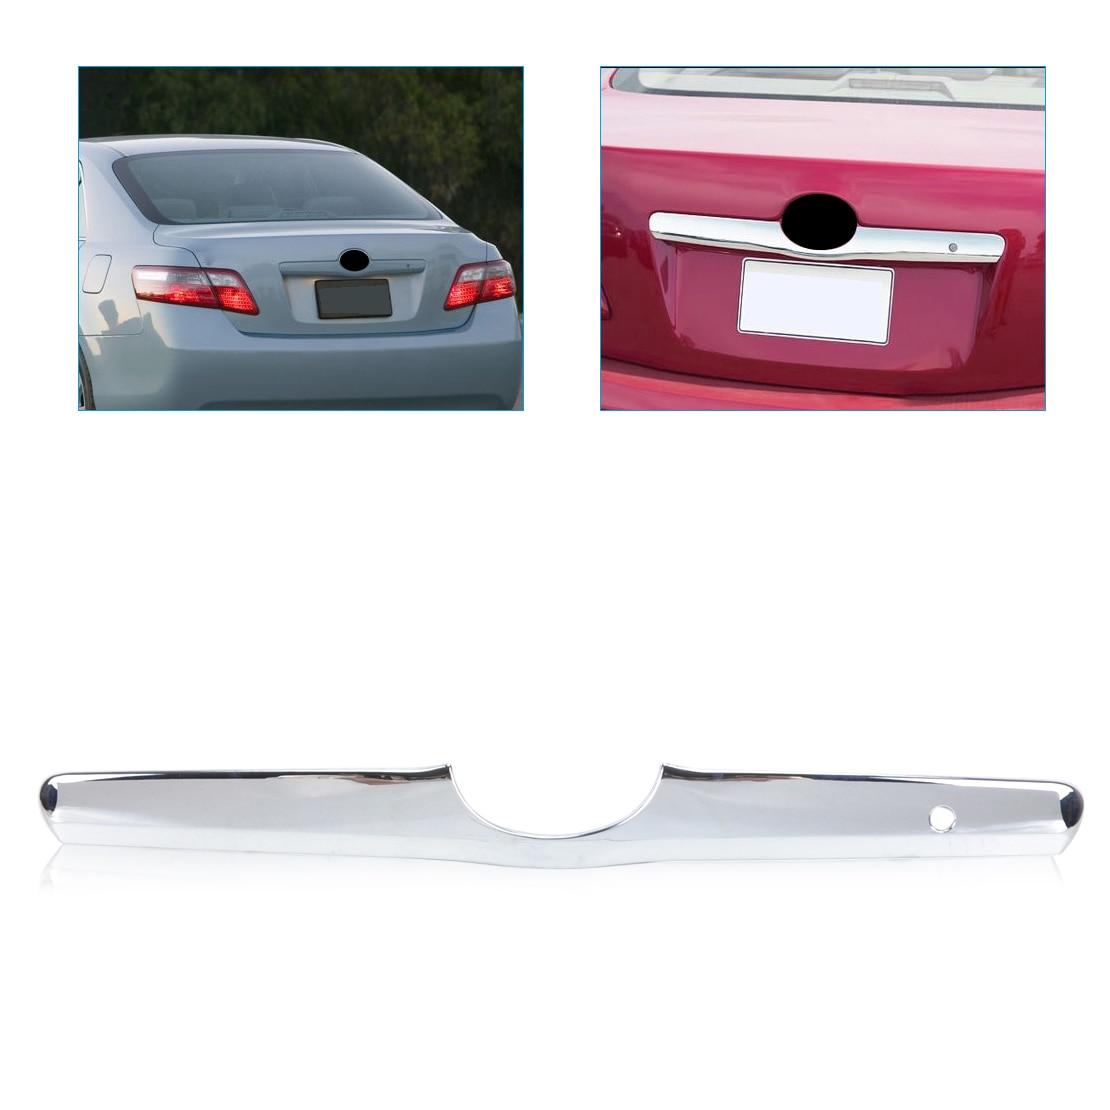 beler ABS Triple Chrome Tailgate Trunk Hatch Trim Bezel Cover for Toyota Camry 2006 2007 2008 2009 2010 2011 car auto accessories rear trunk trim tail door trim for subaru xv 2009 2010 2011 2012 2013 2014 abs chrome 1pc per set